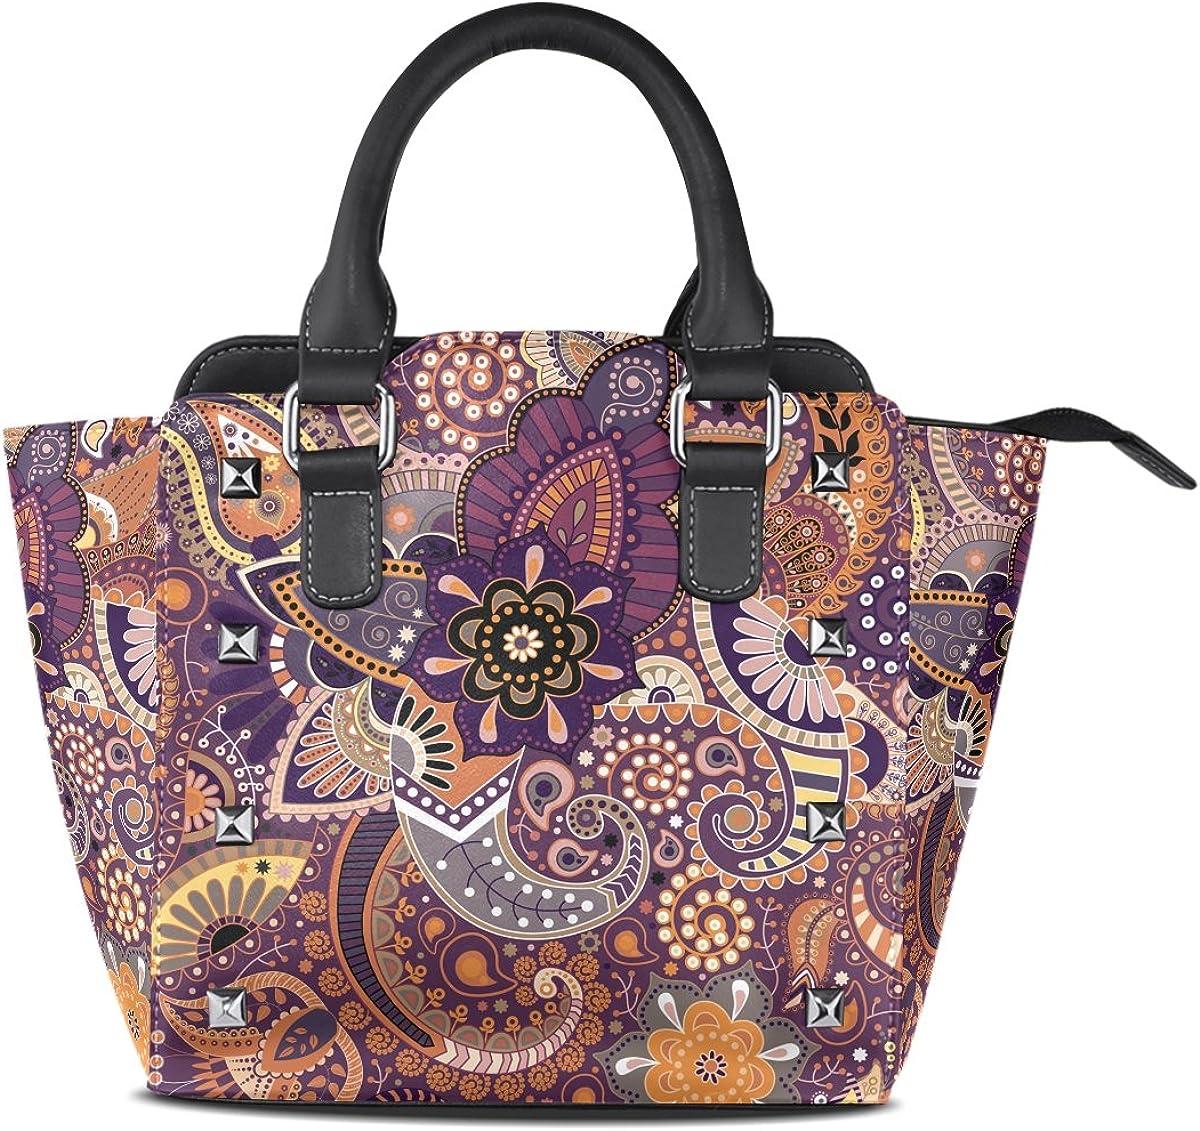 Jennifer PU Leather Top-Handle Handbags Cool Paisley Floral Pattern Single-Shoulder Tote Crossbody Bag Messenger Bags For Women